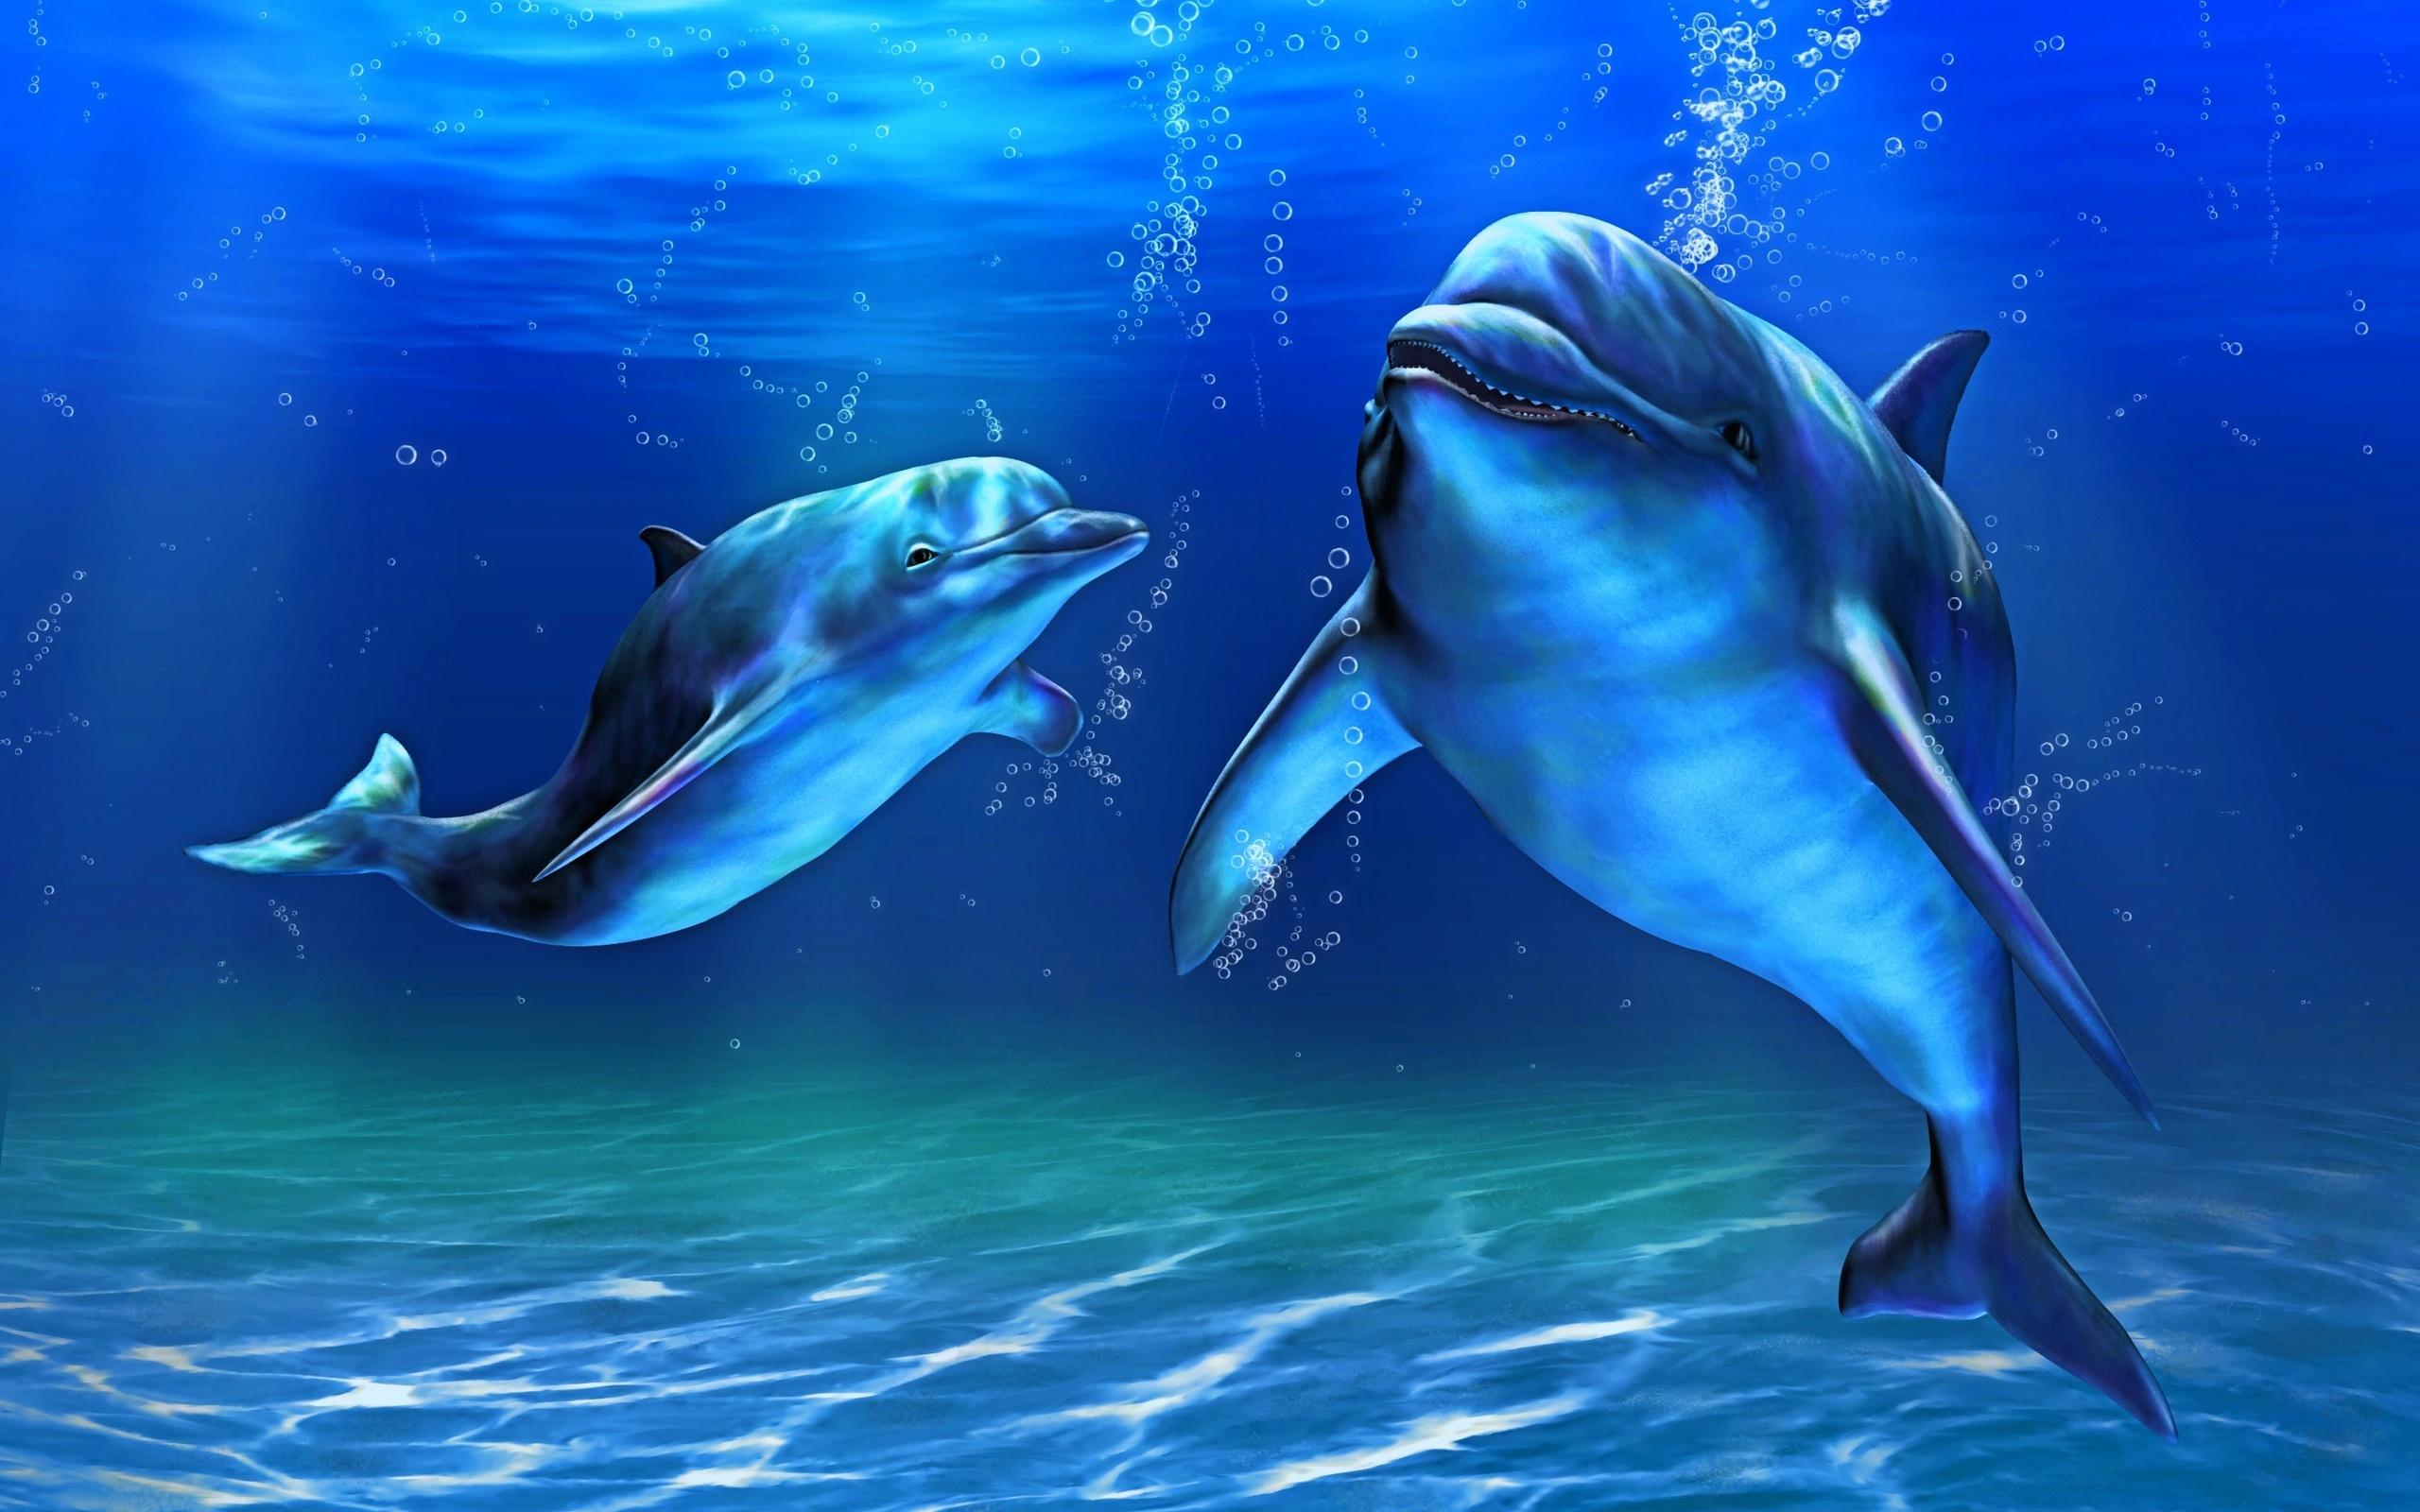 картинка с морскими обитателями джигурды